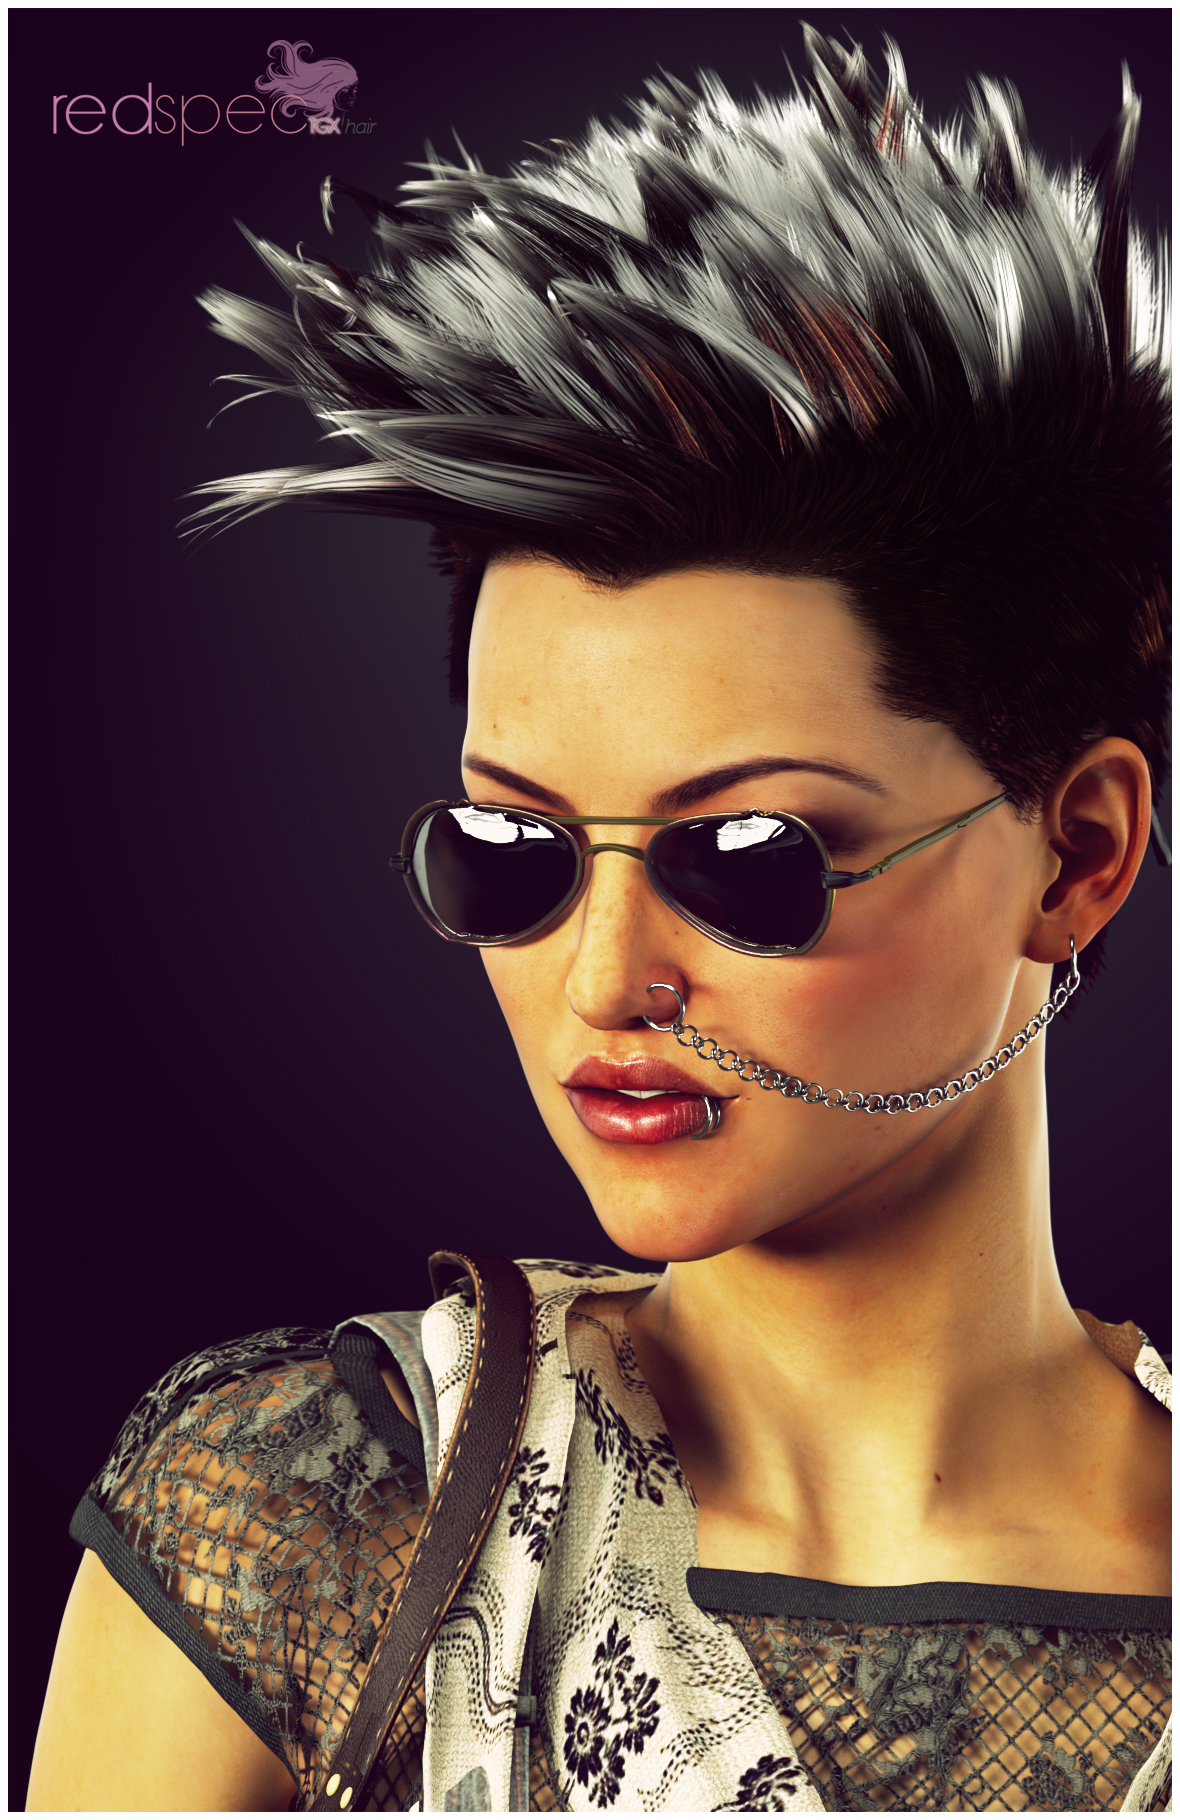 Redspec TGX Hair Female Promo 1 by TRRazor